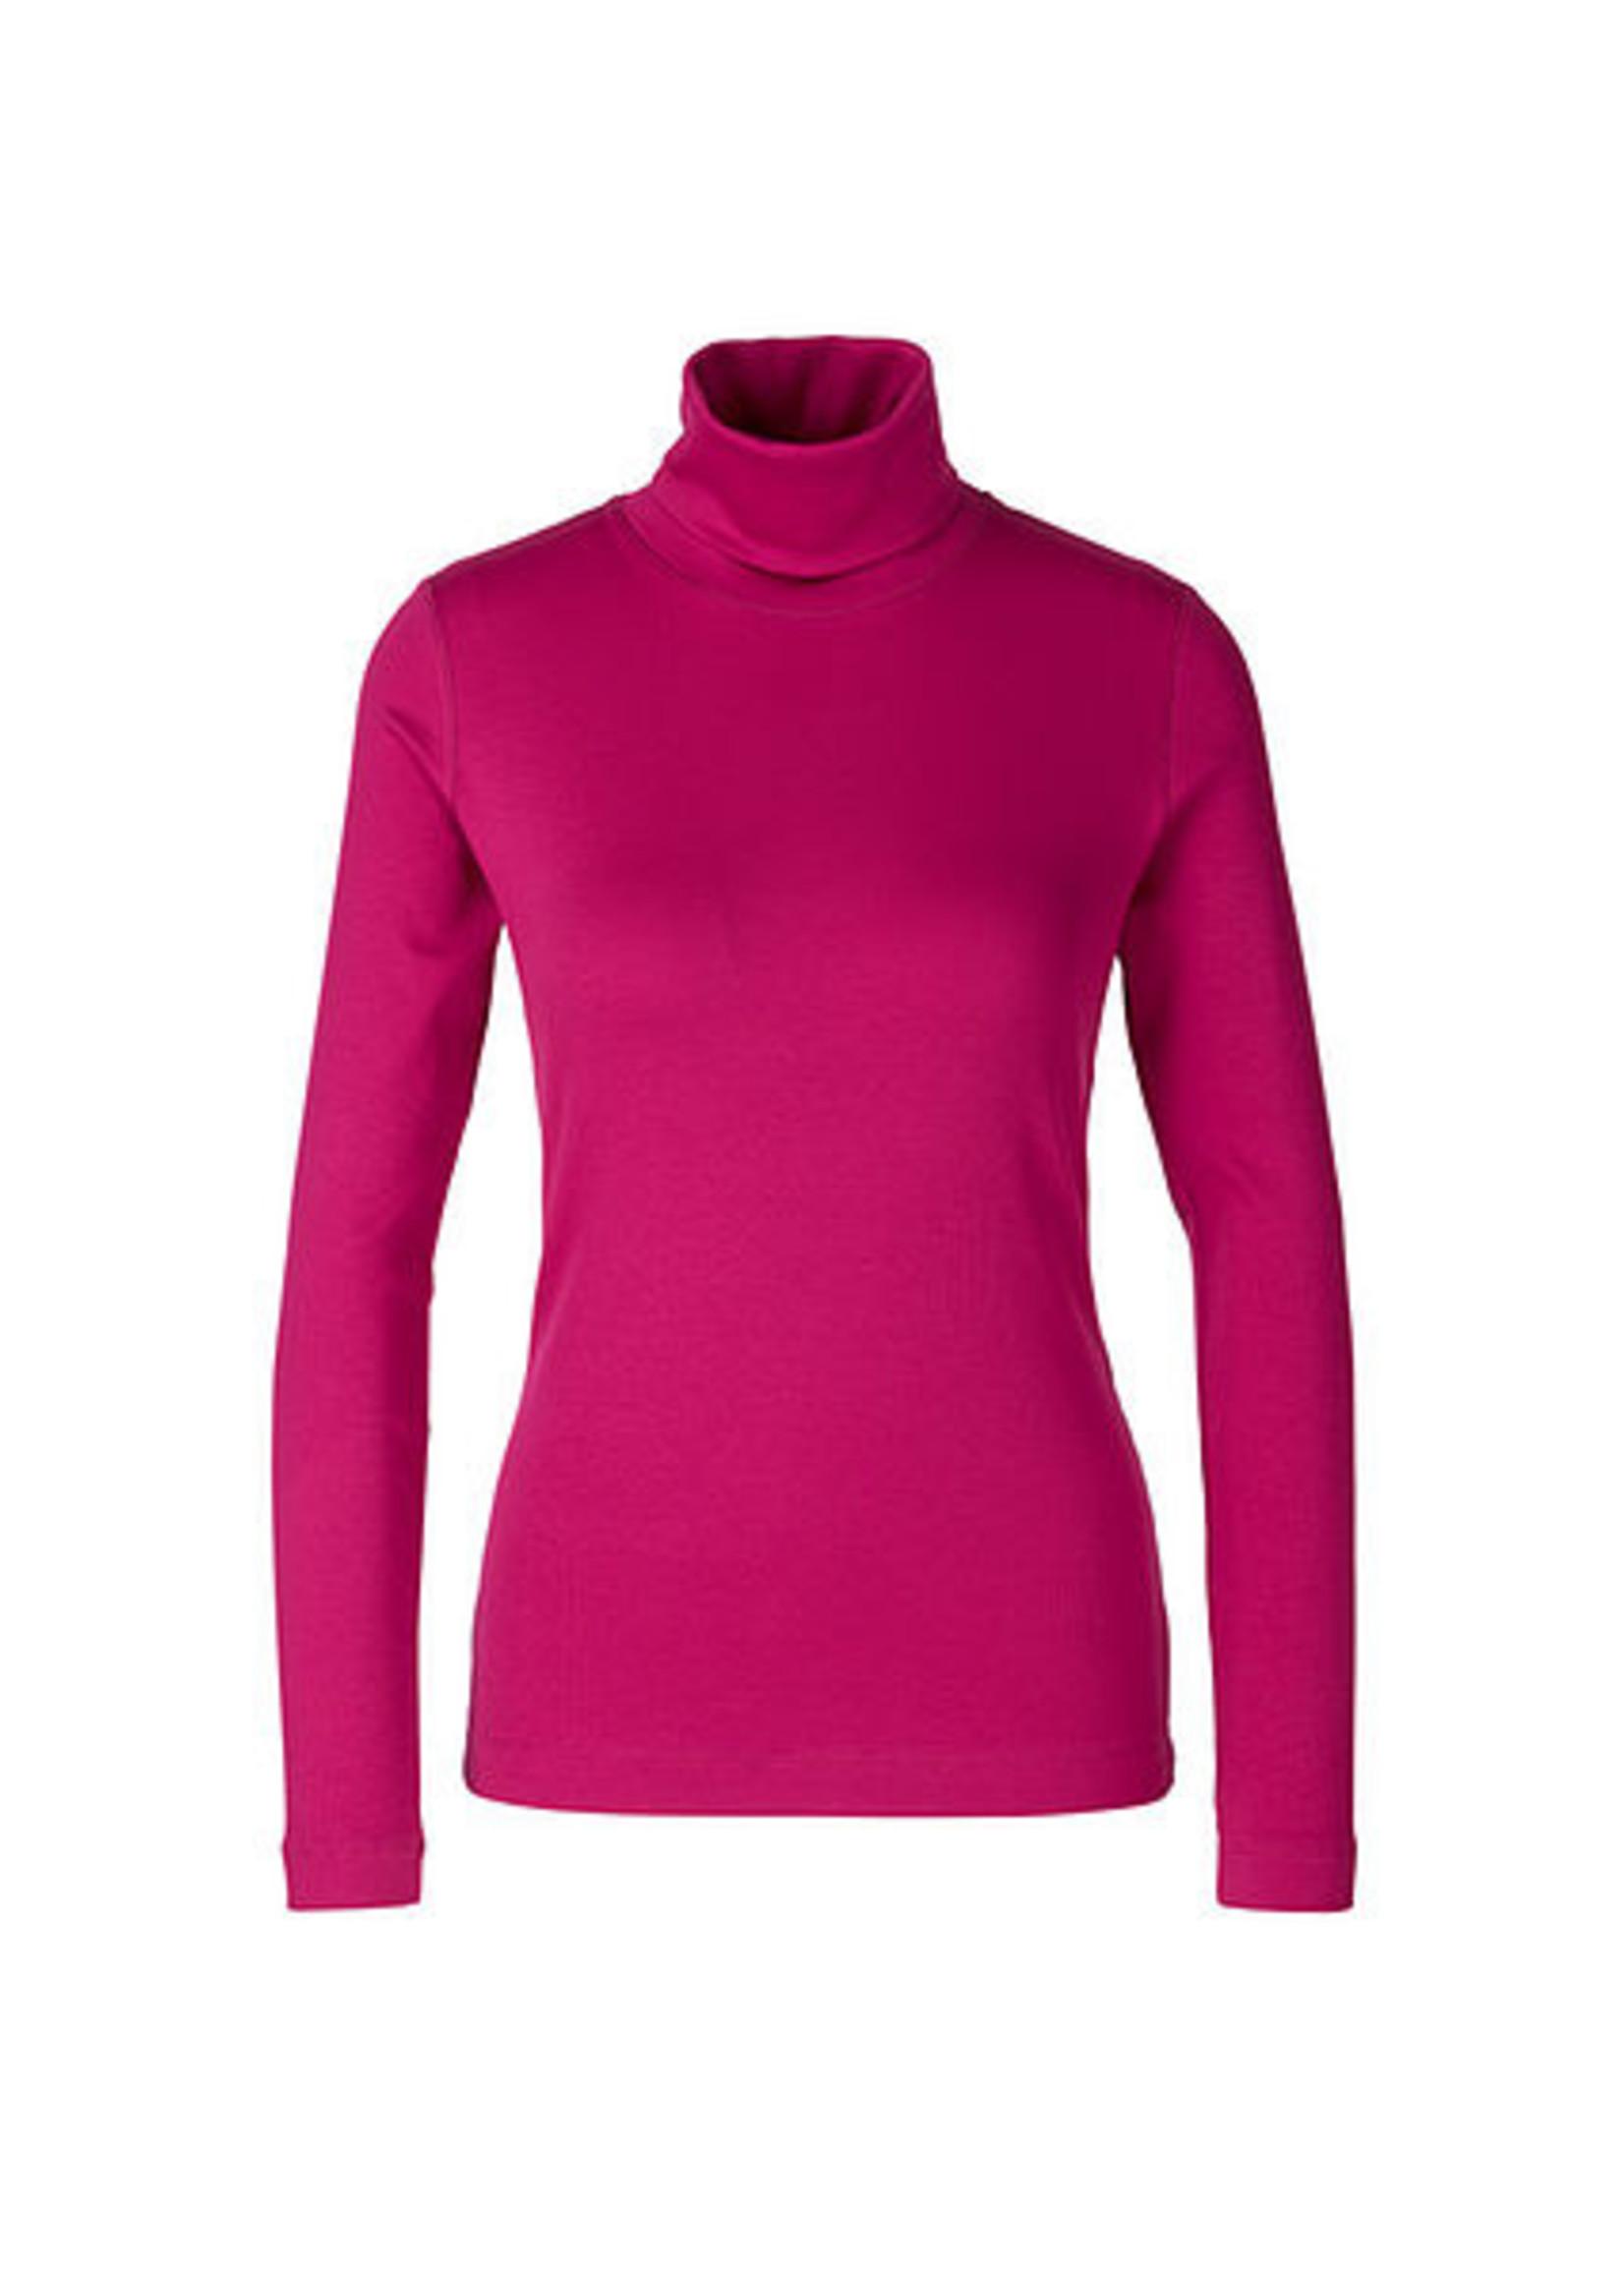 Marccain Sports T-shirt RS 48.22 J50 fresh magenta